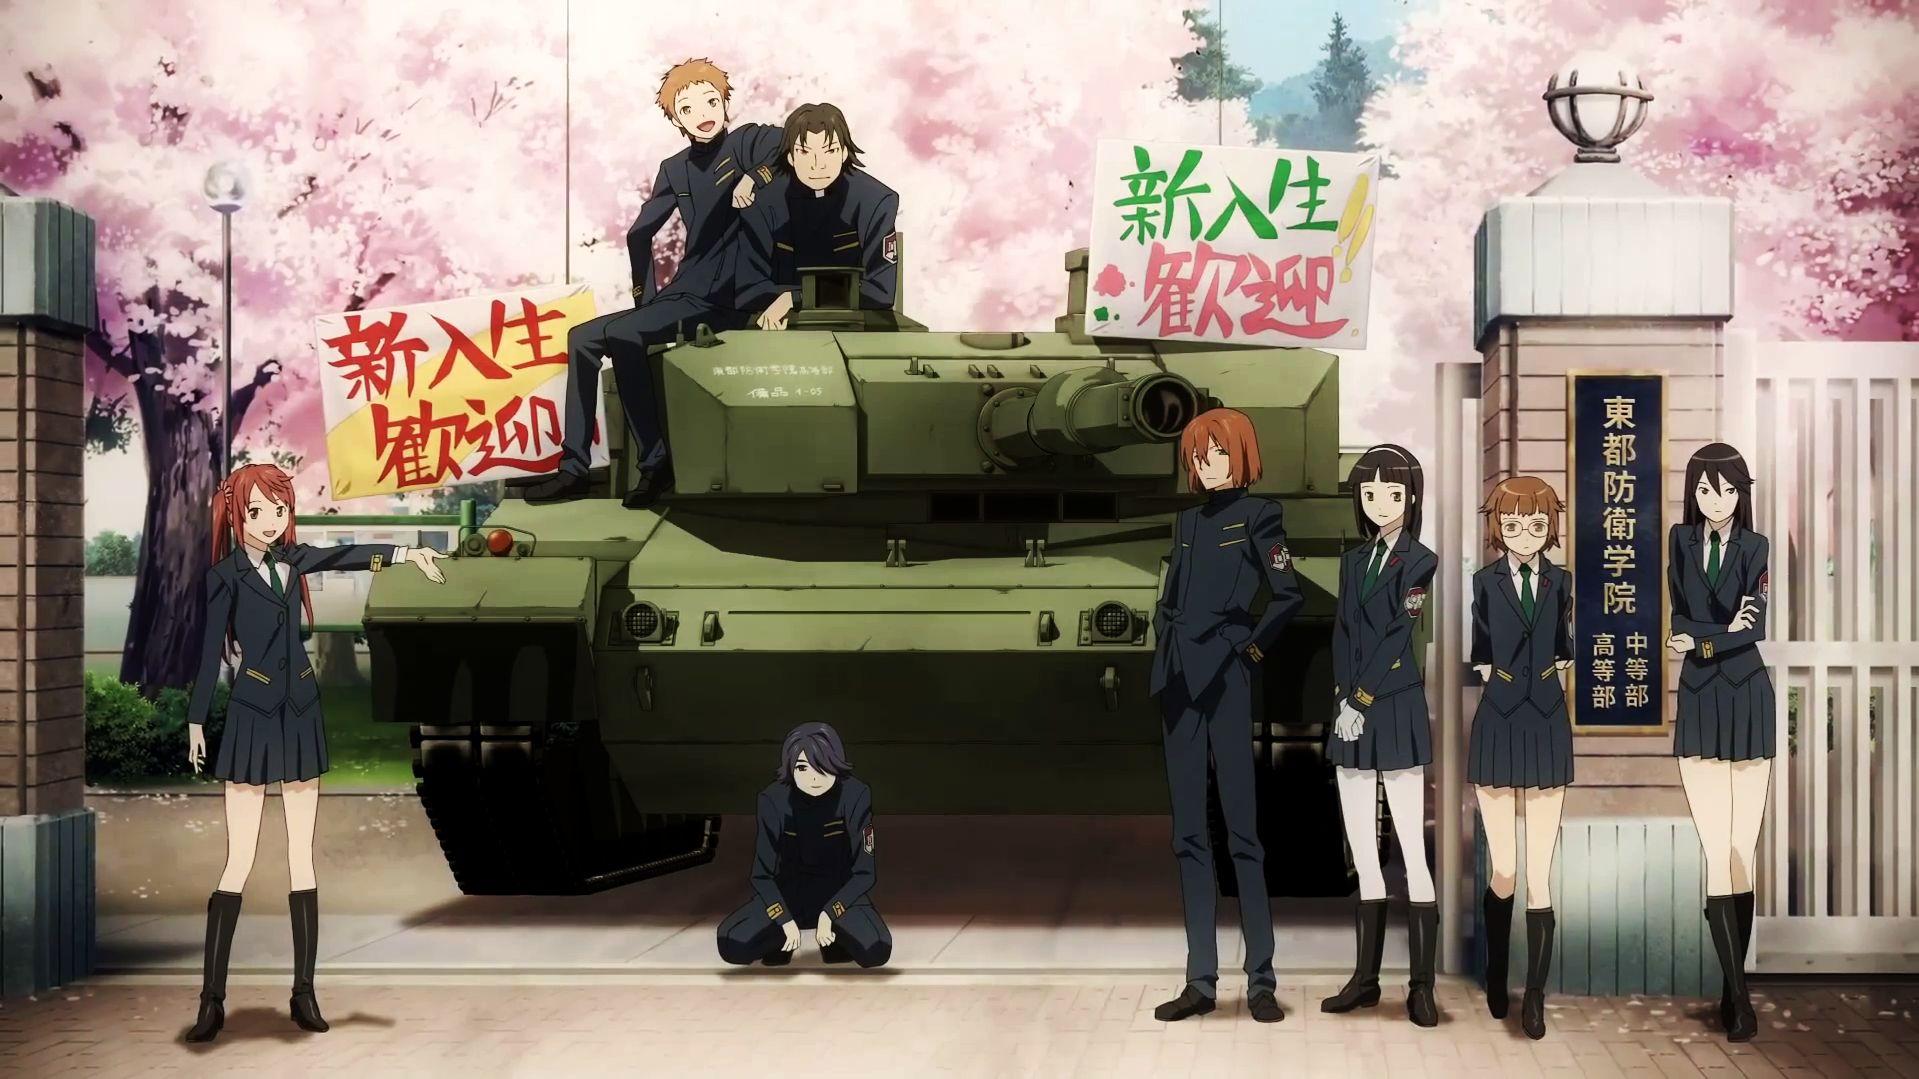 Basket Army Anime AnimeClickit